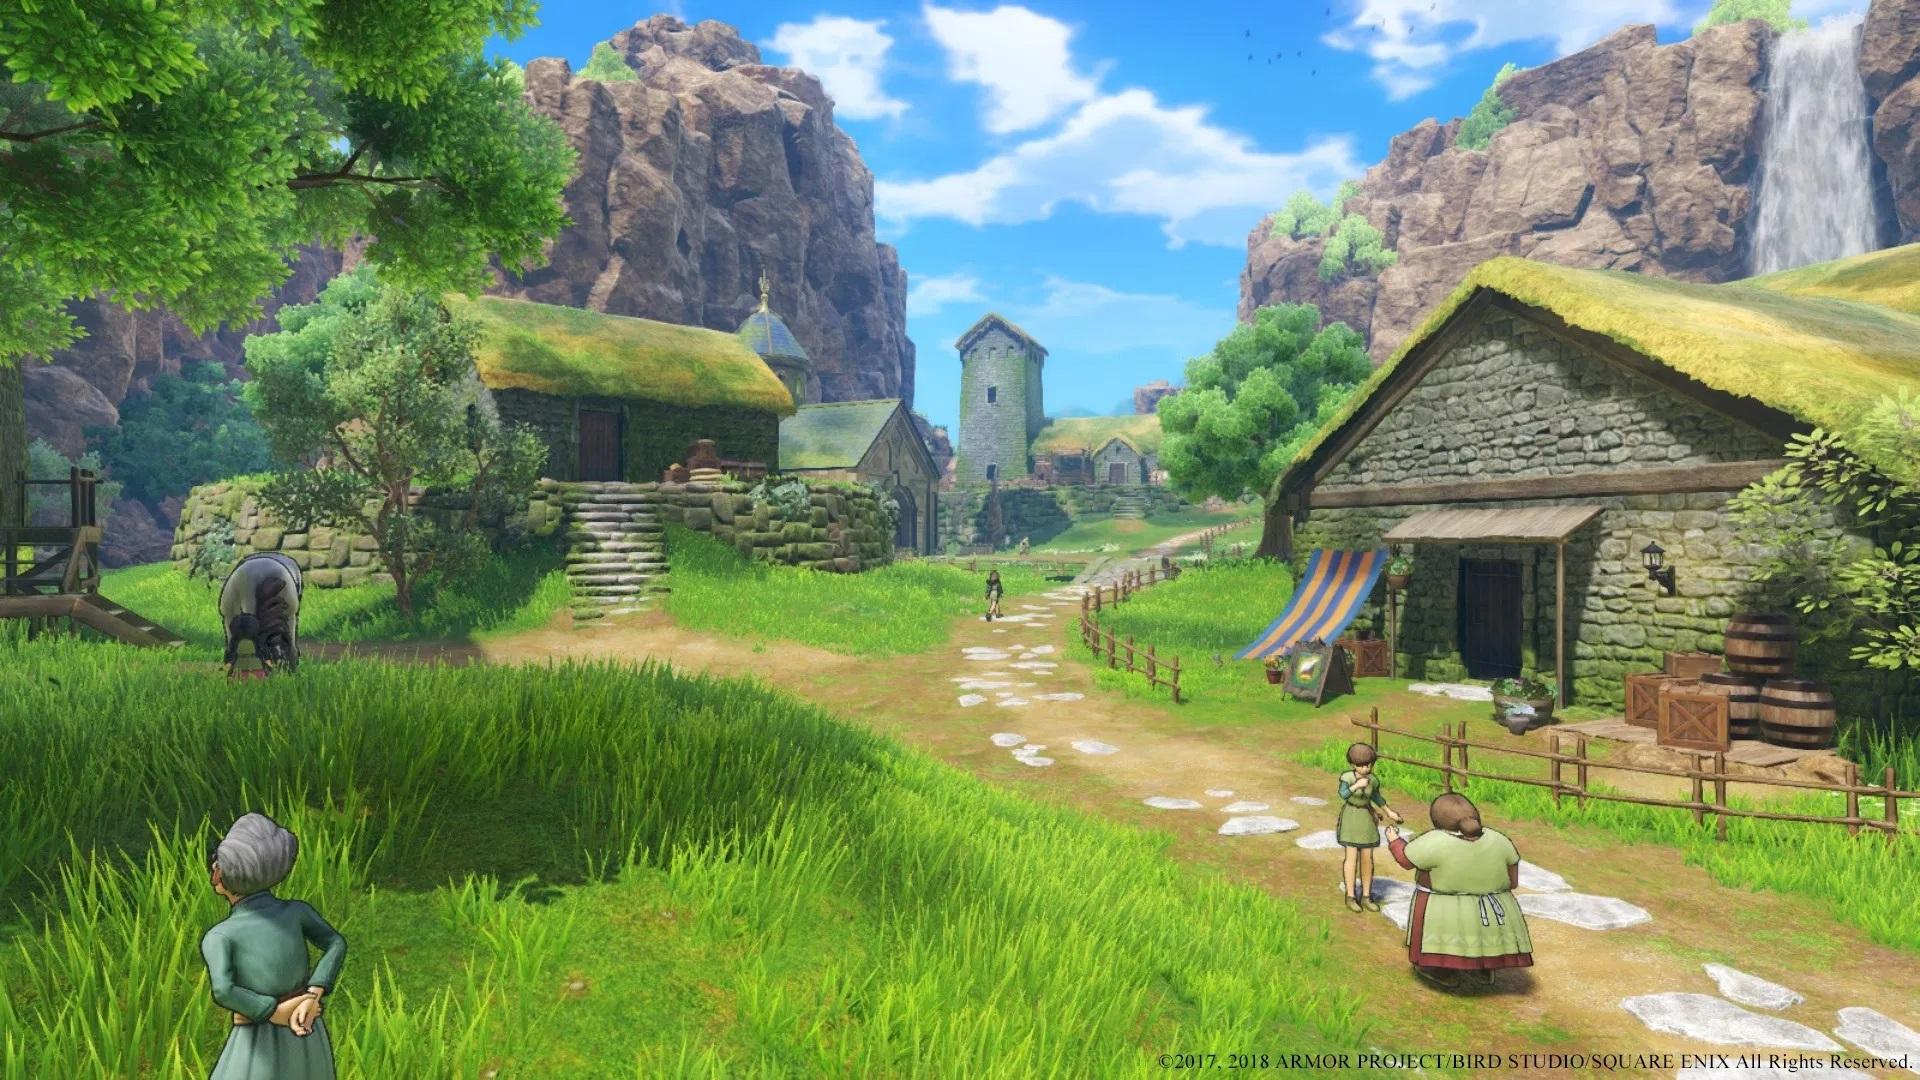 dragon-quest-xi-echoes-of-an-elusive-age-pc-screenshot-1